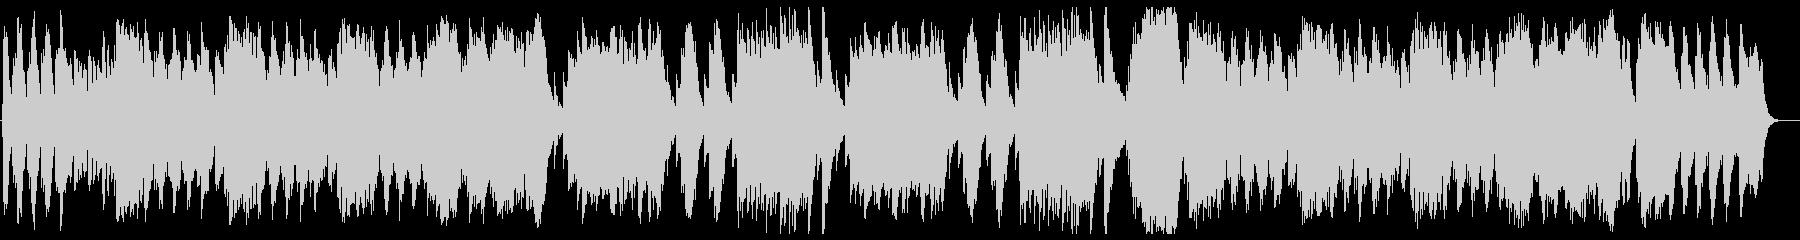 Spring Voice (J. Strauss II)'s unreproduced waveform